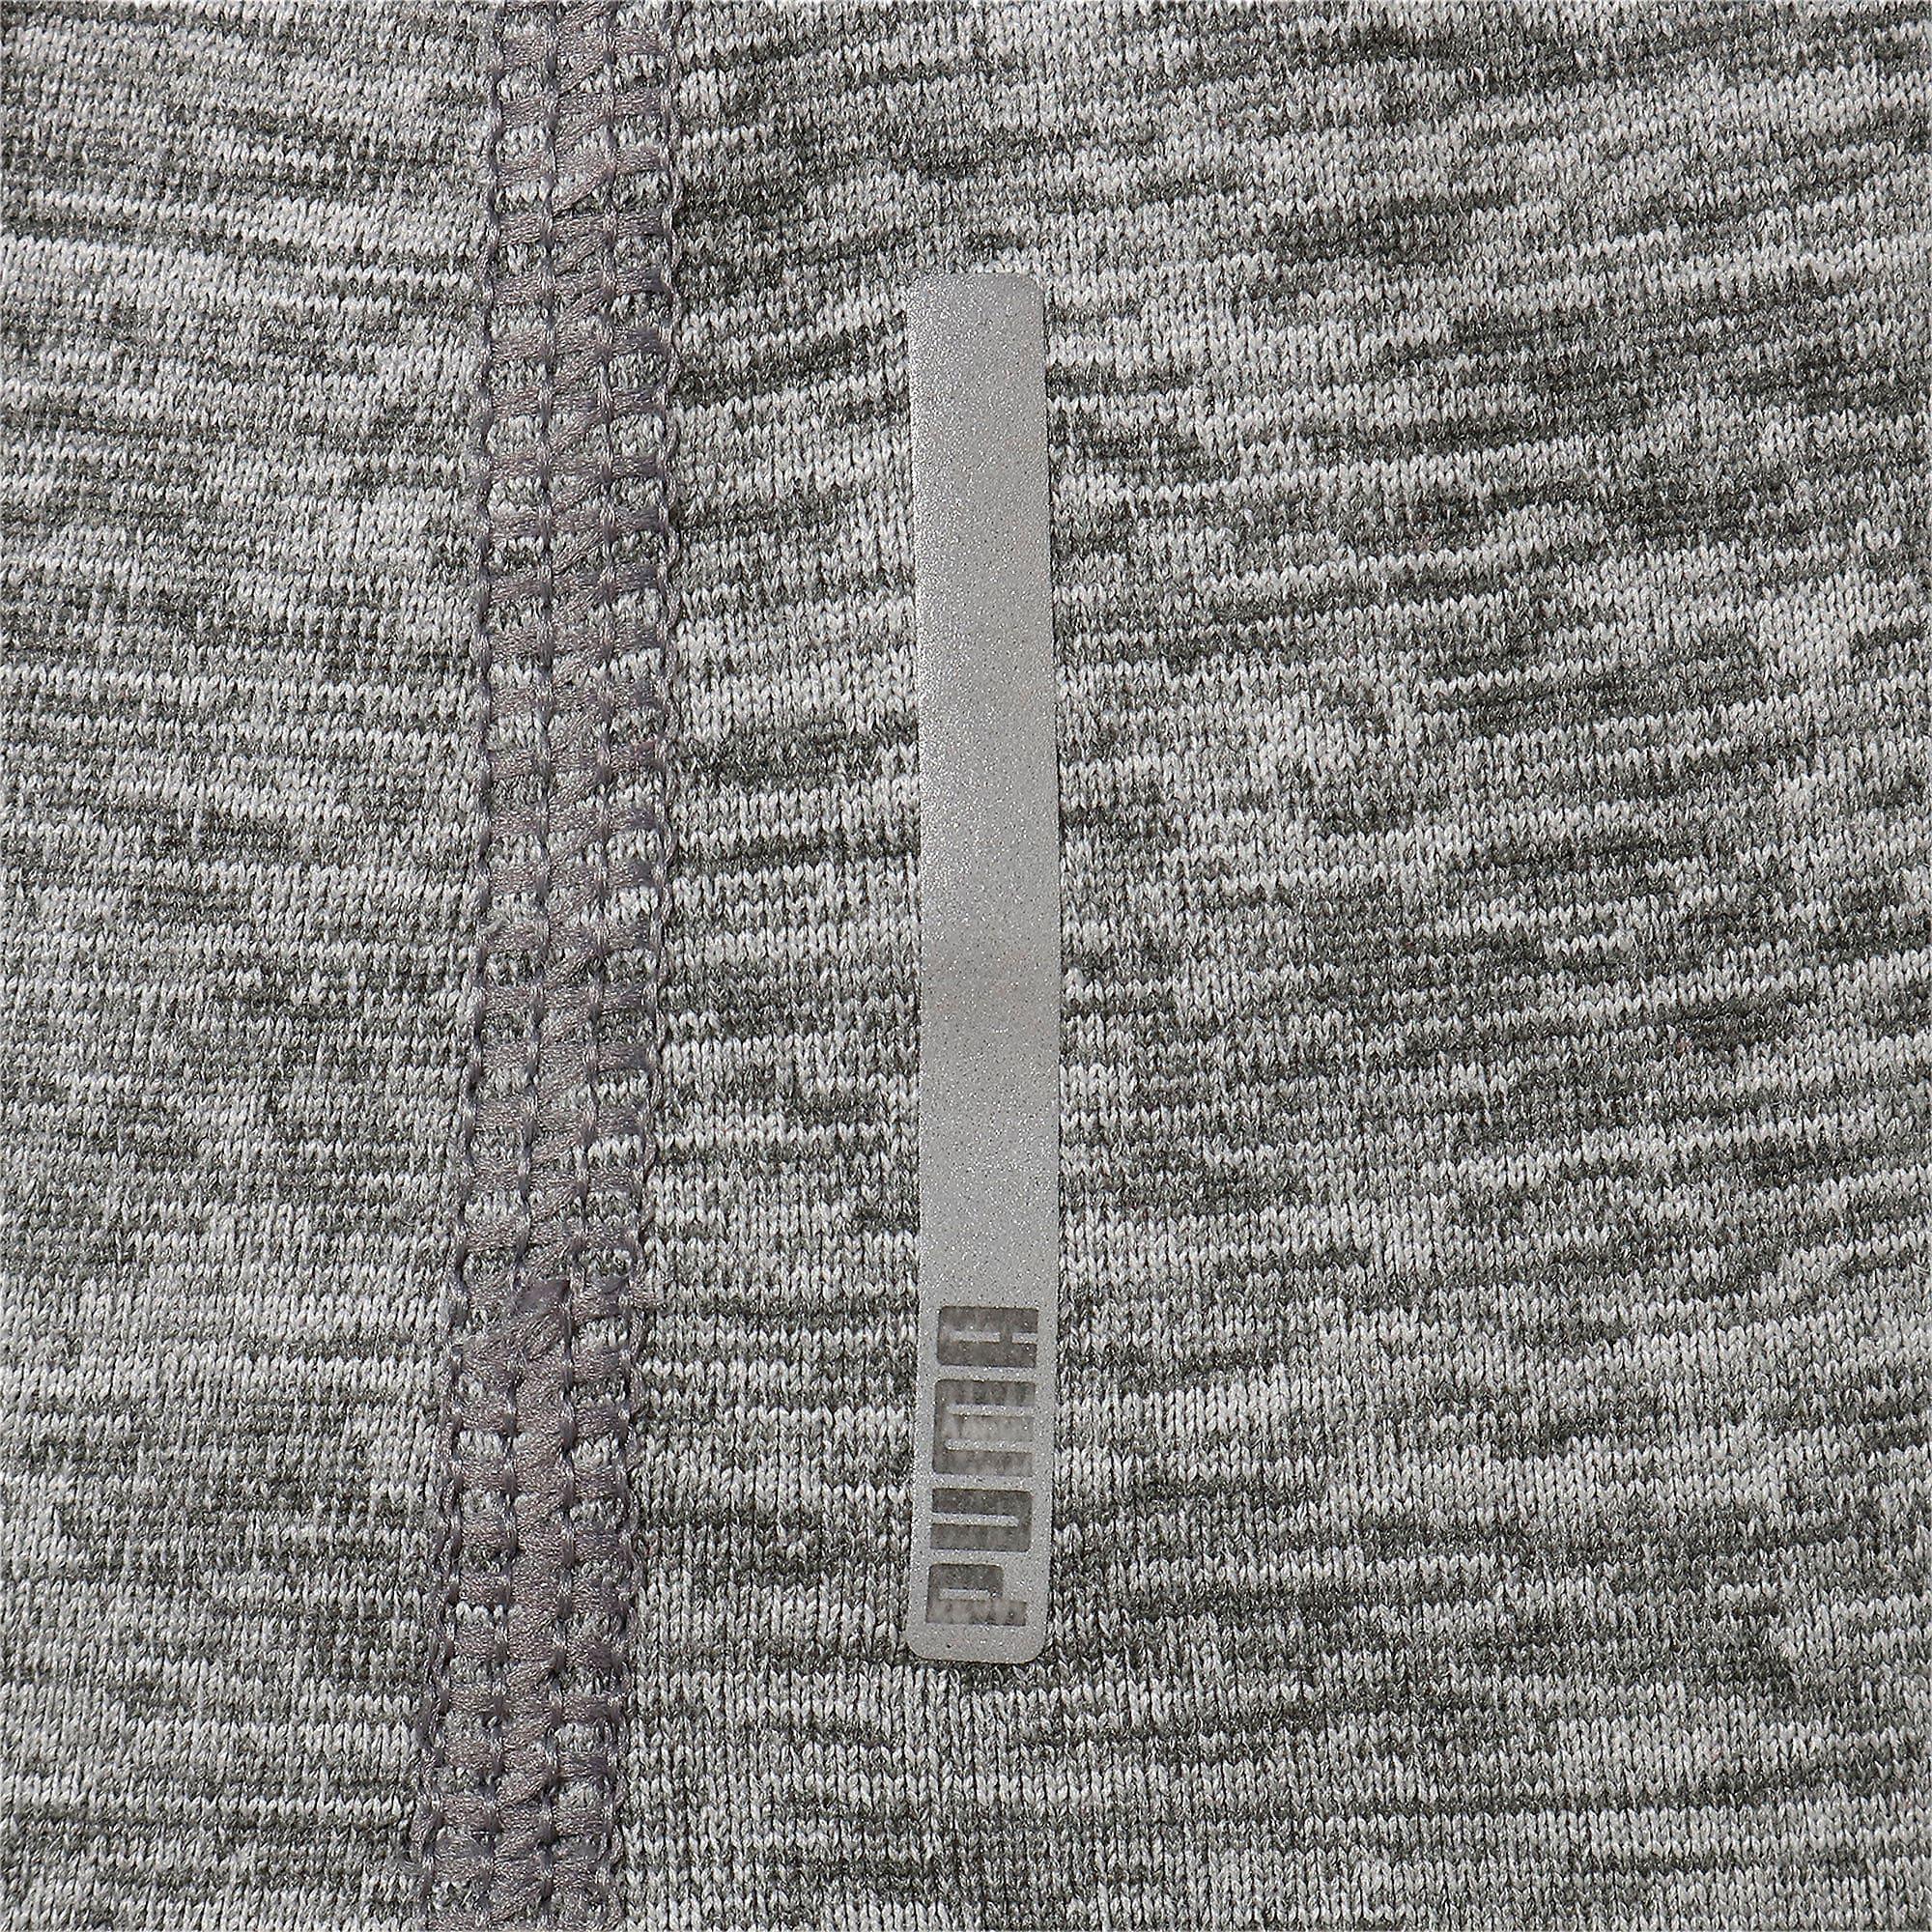 Thumbnail 9 of ヘザー キャット ウィメンズ ランニング Tシャツ 半袖, Medium Gray Heather, medium-JPN